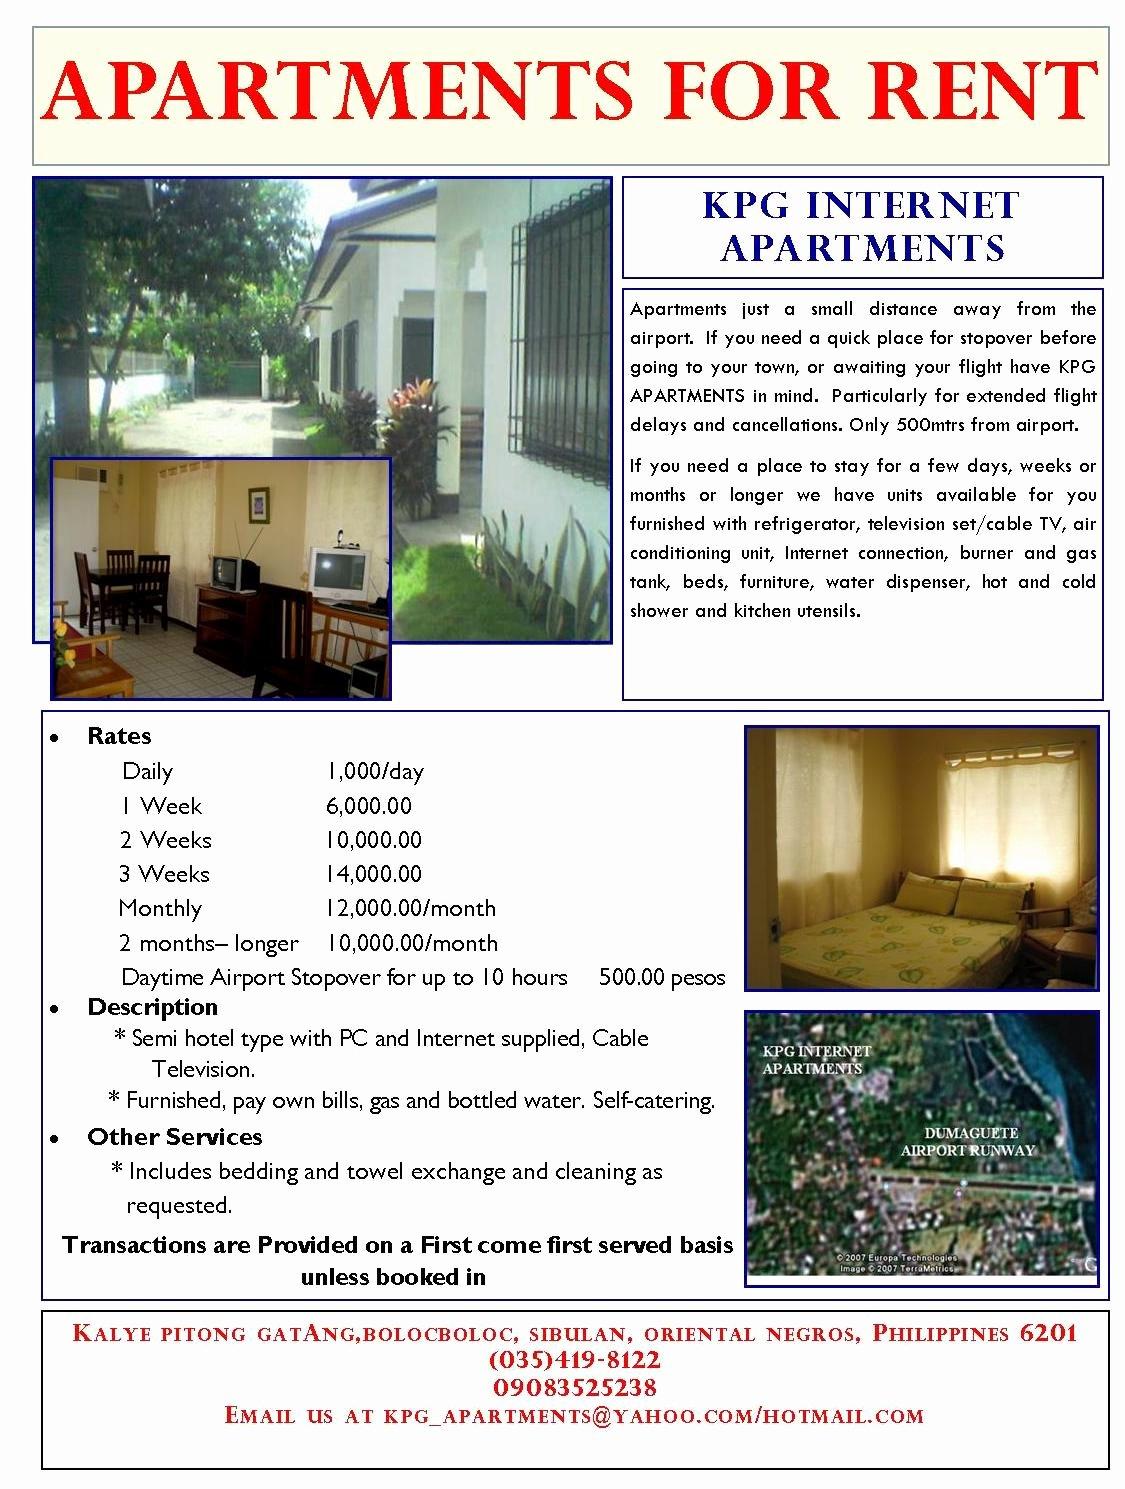 Apartment for Rent Flyer Template Elegant Apartment Ads